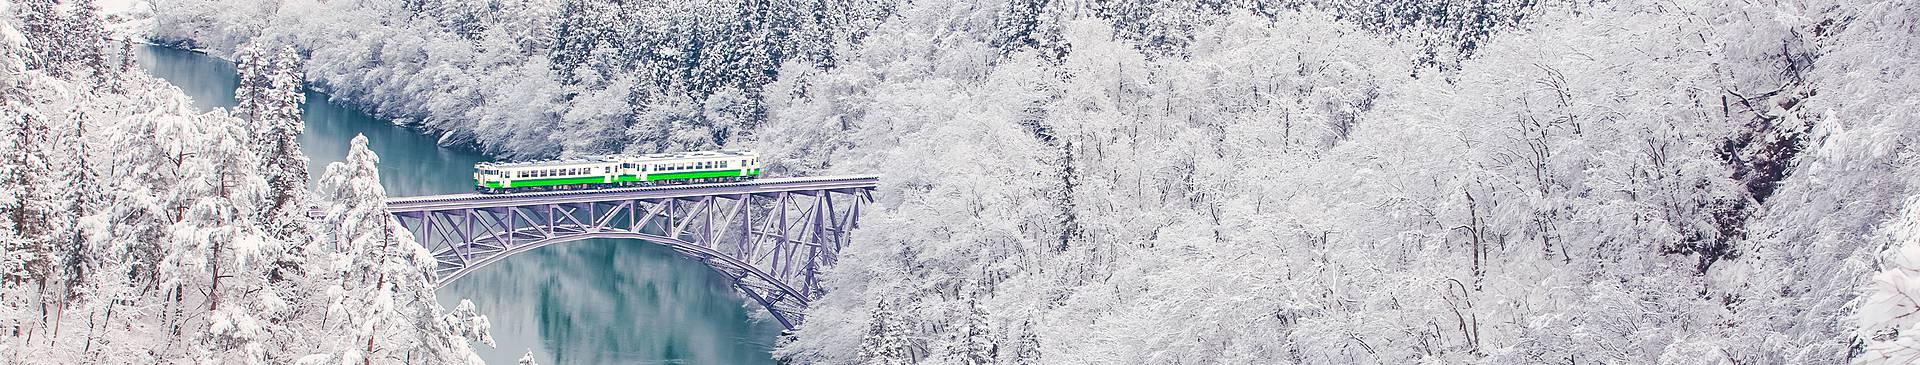 Viaggi in Giappone in inverno